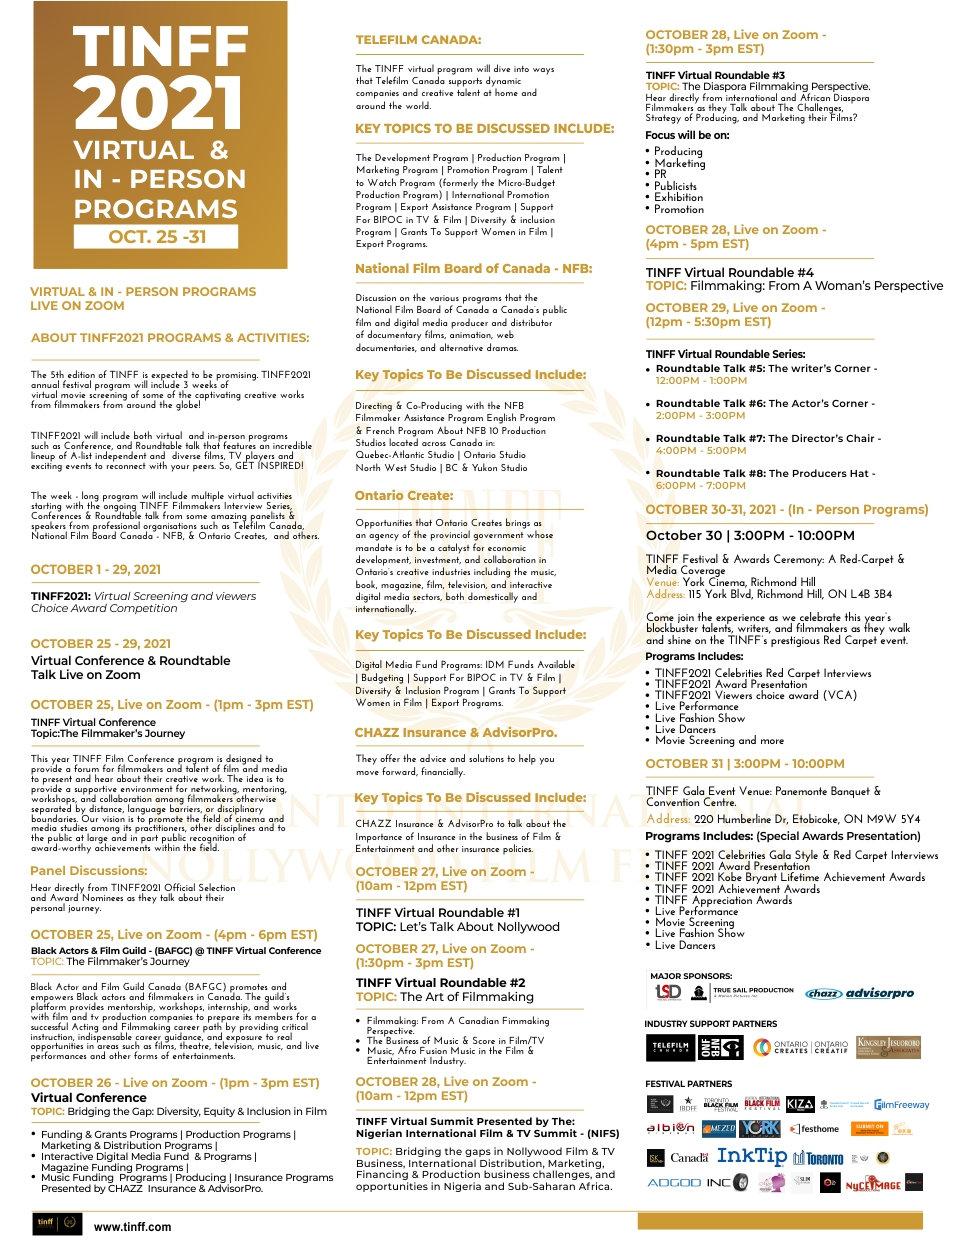 TINFF2021 VIRTUAL & IN-PERSON PROGRAMS.jpg